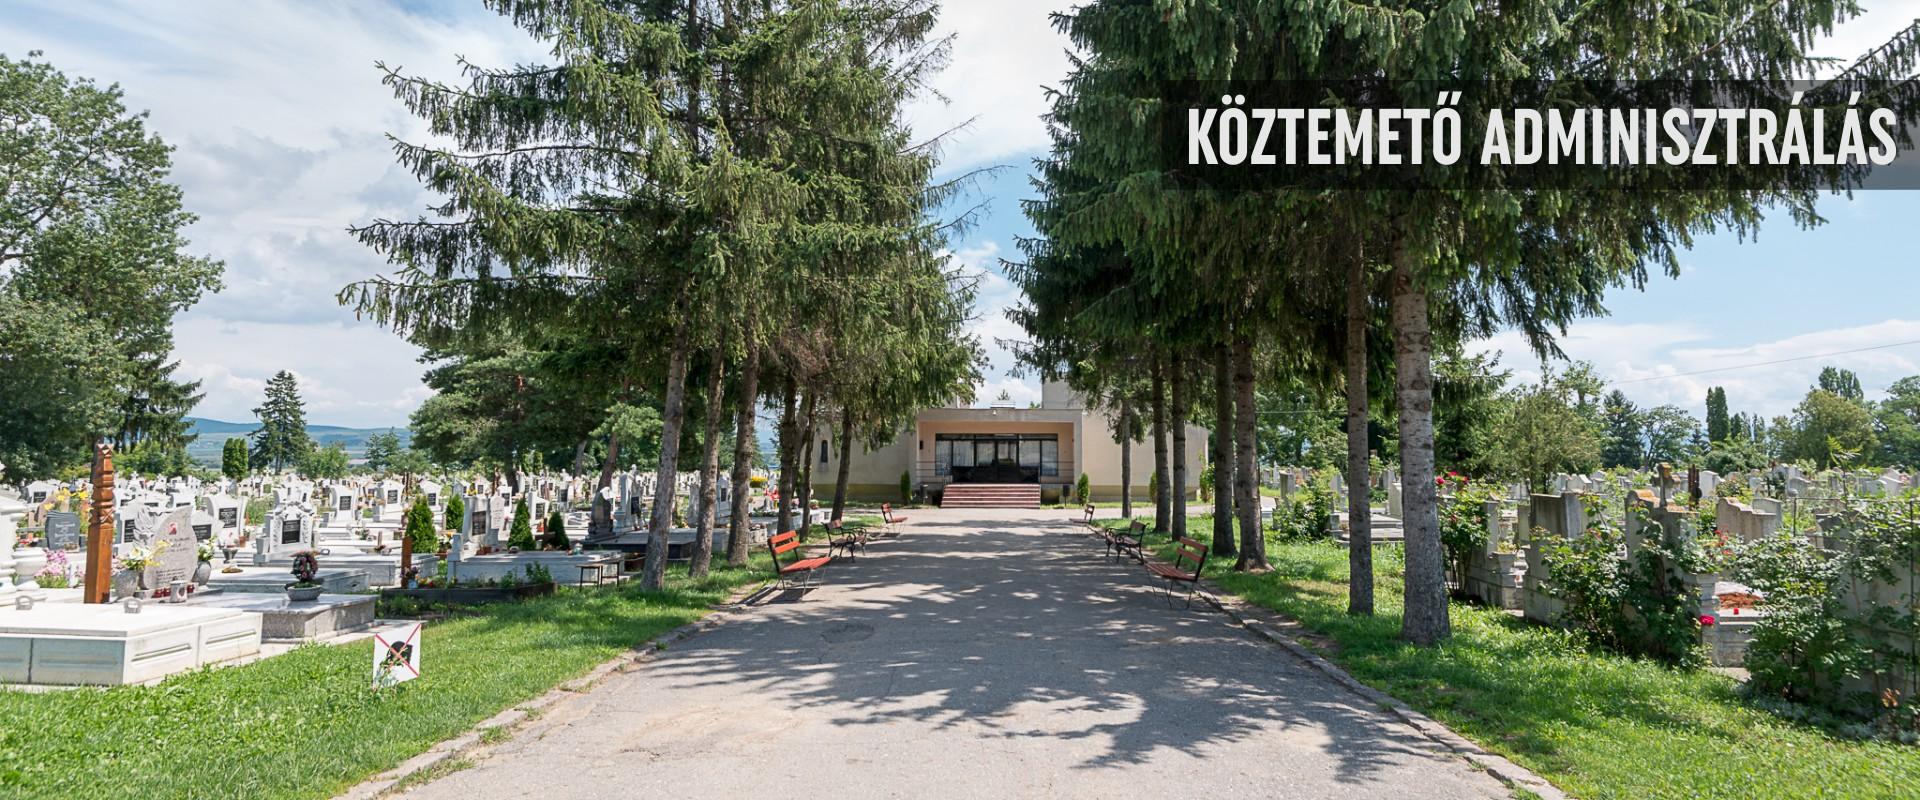 Koztemeto